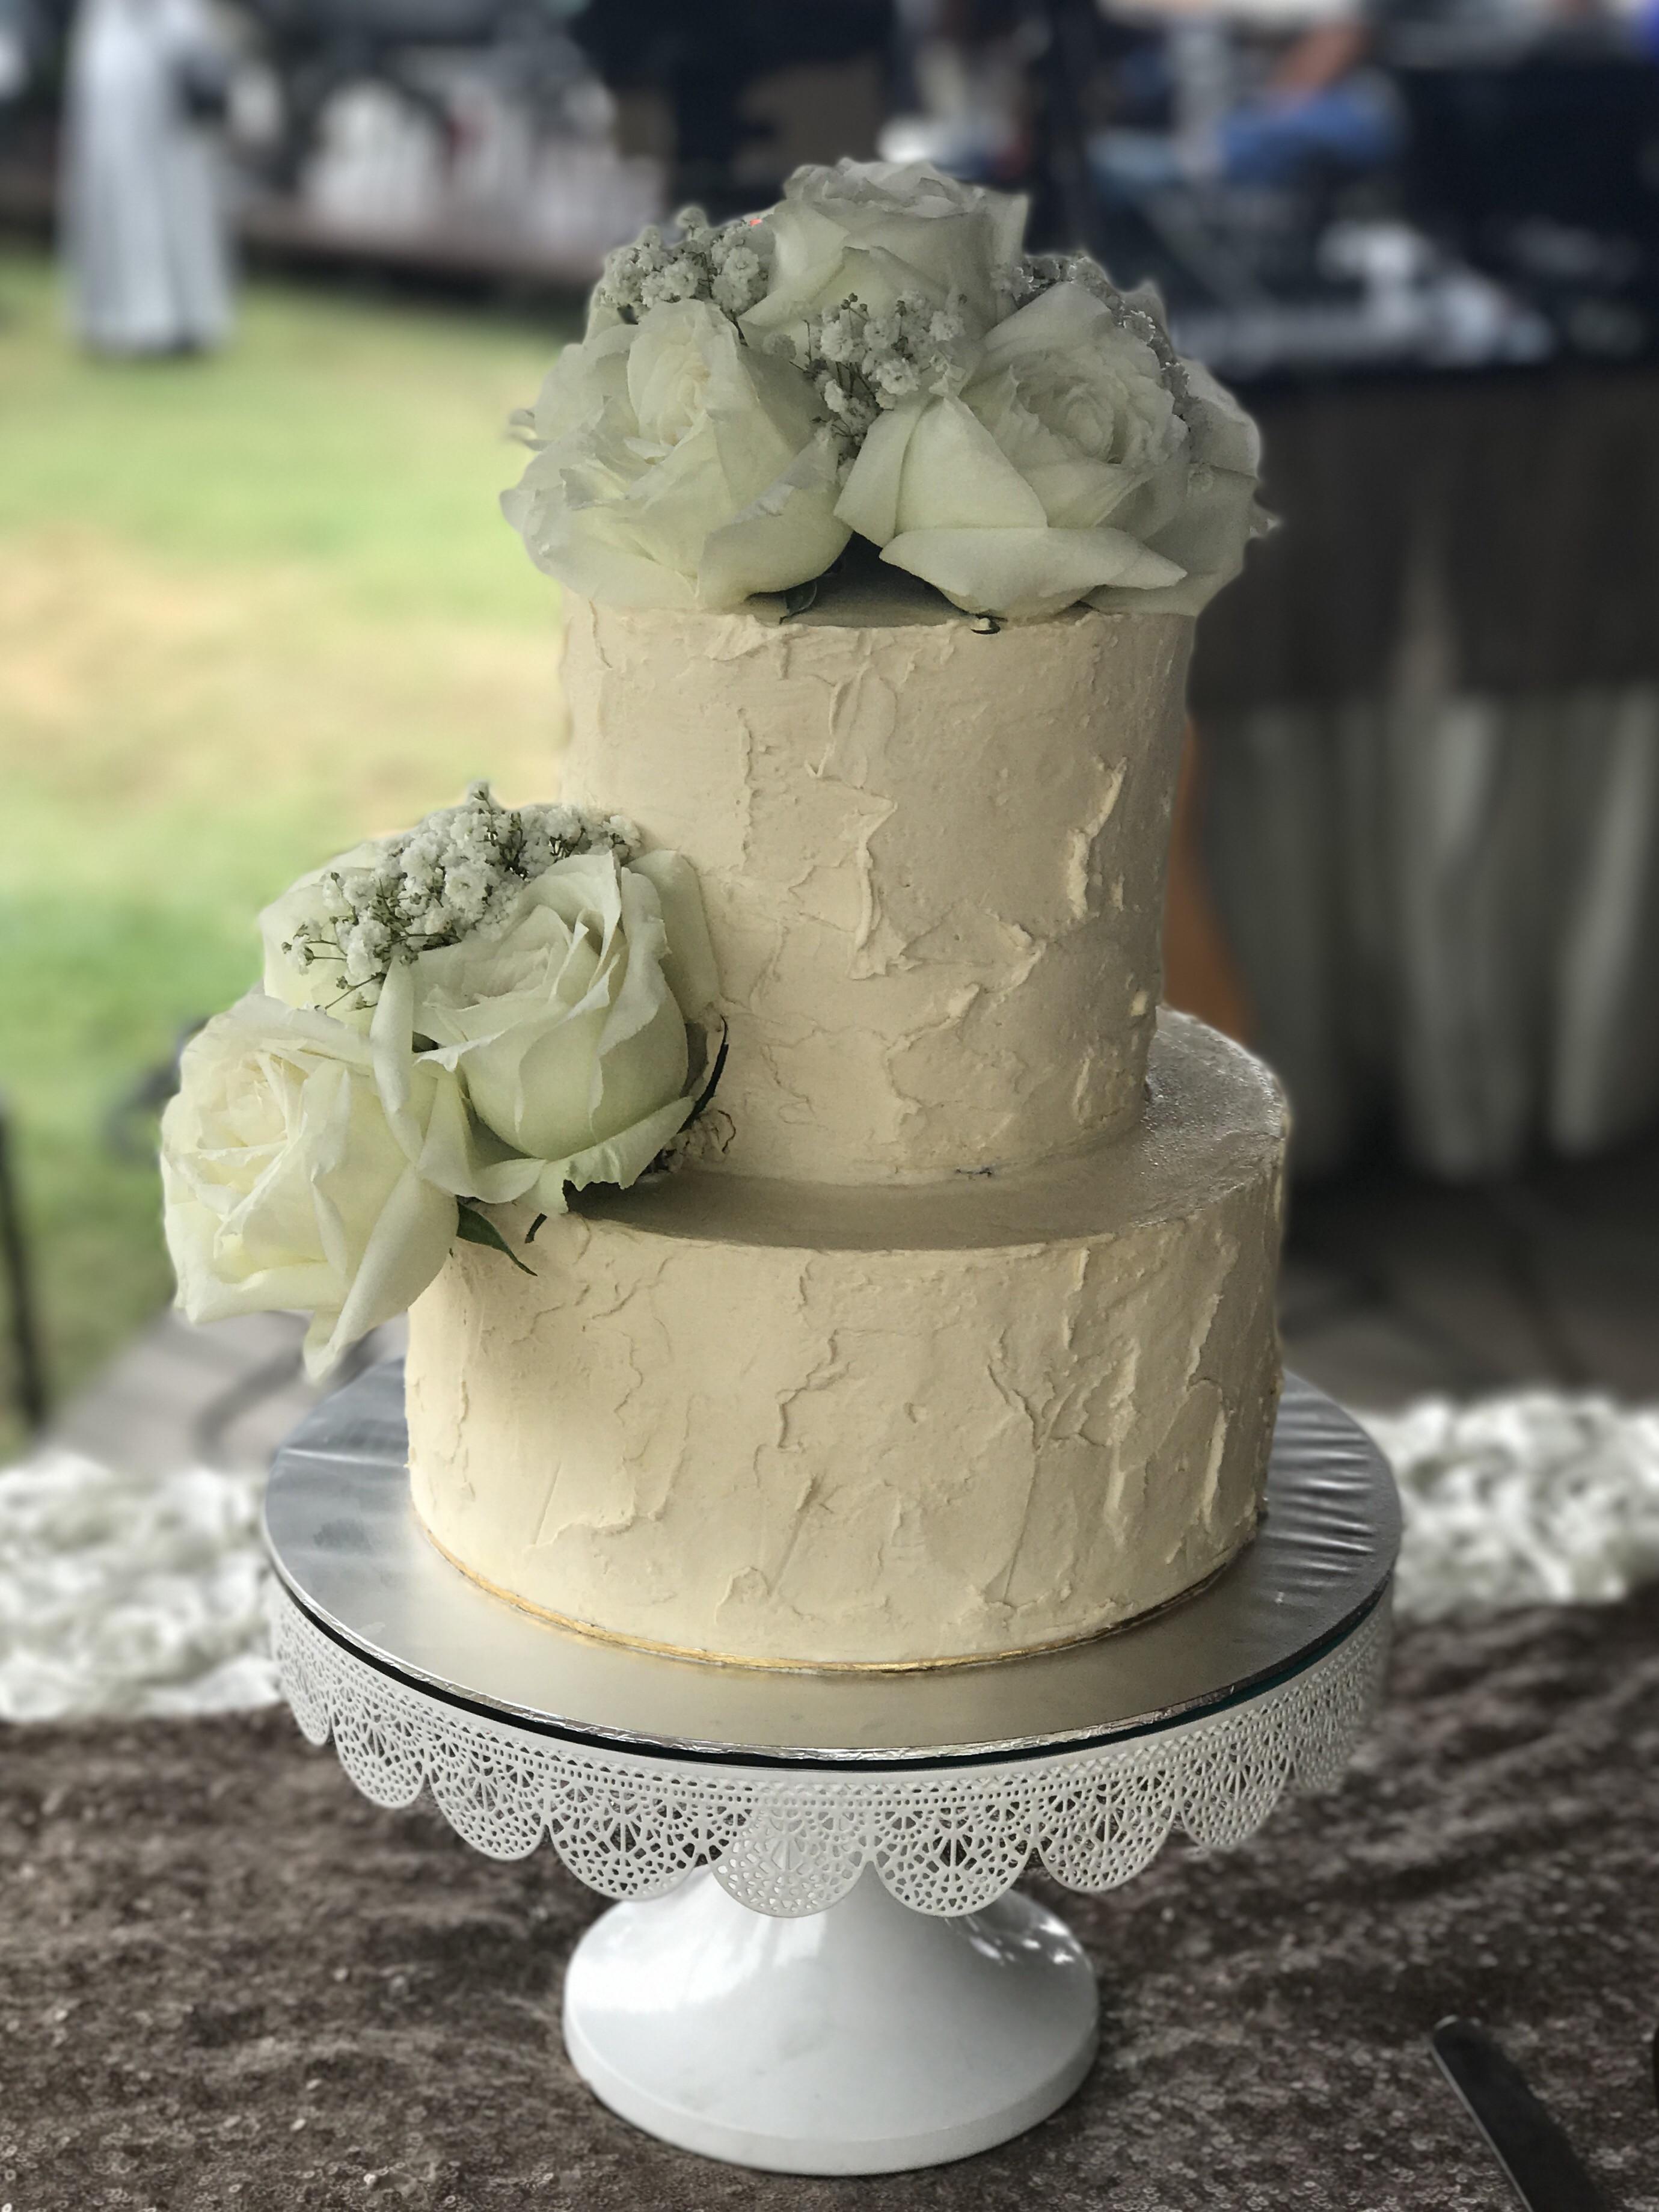 Buttercream Wedding Cakes  Rustic Buttercream Wedding Cake Sooperlicious Cakes